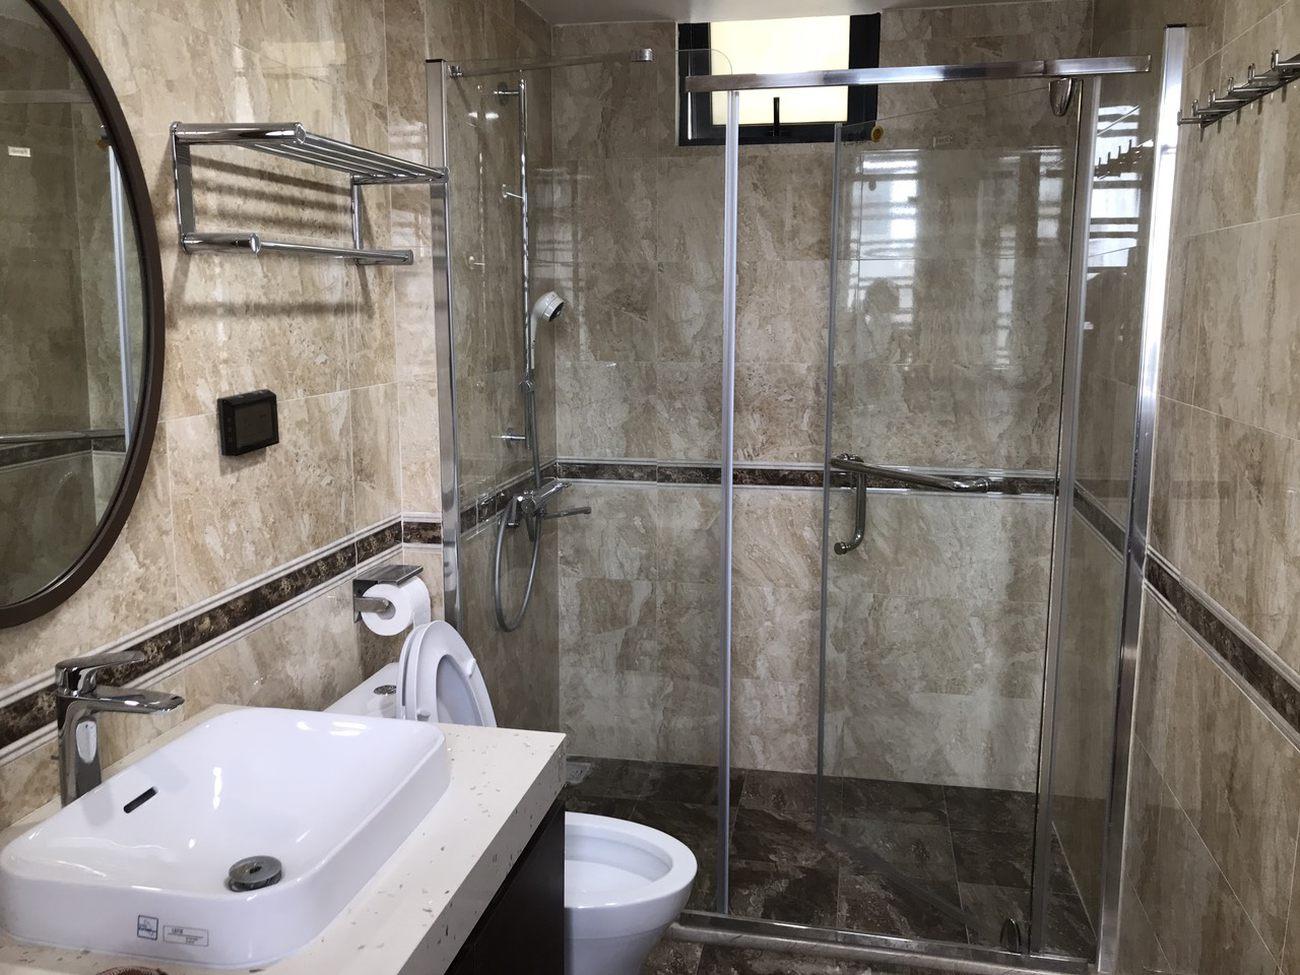 ho-mslinh-s-house-in-long-bien-hanoi-bathroomjpg-1629110279.jpg